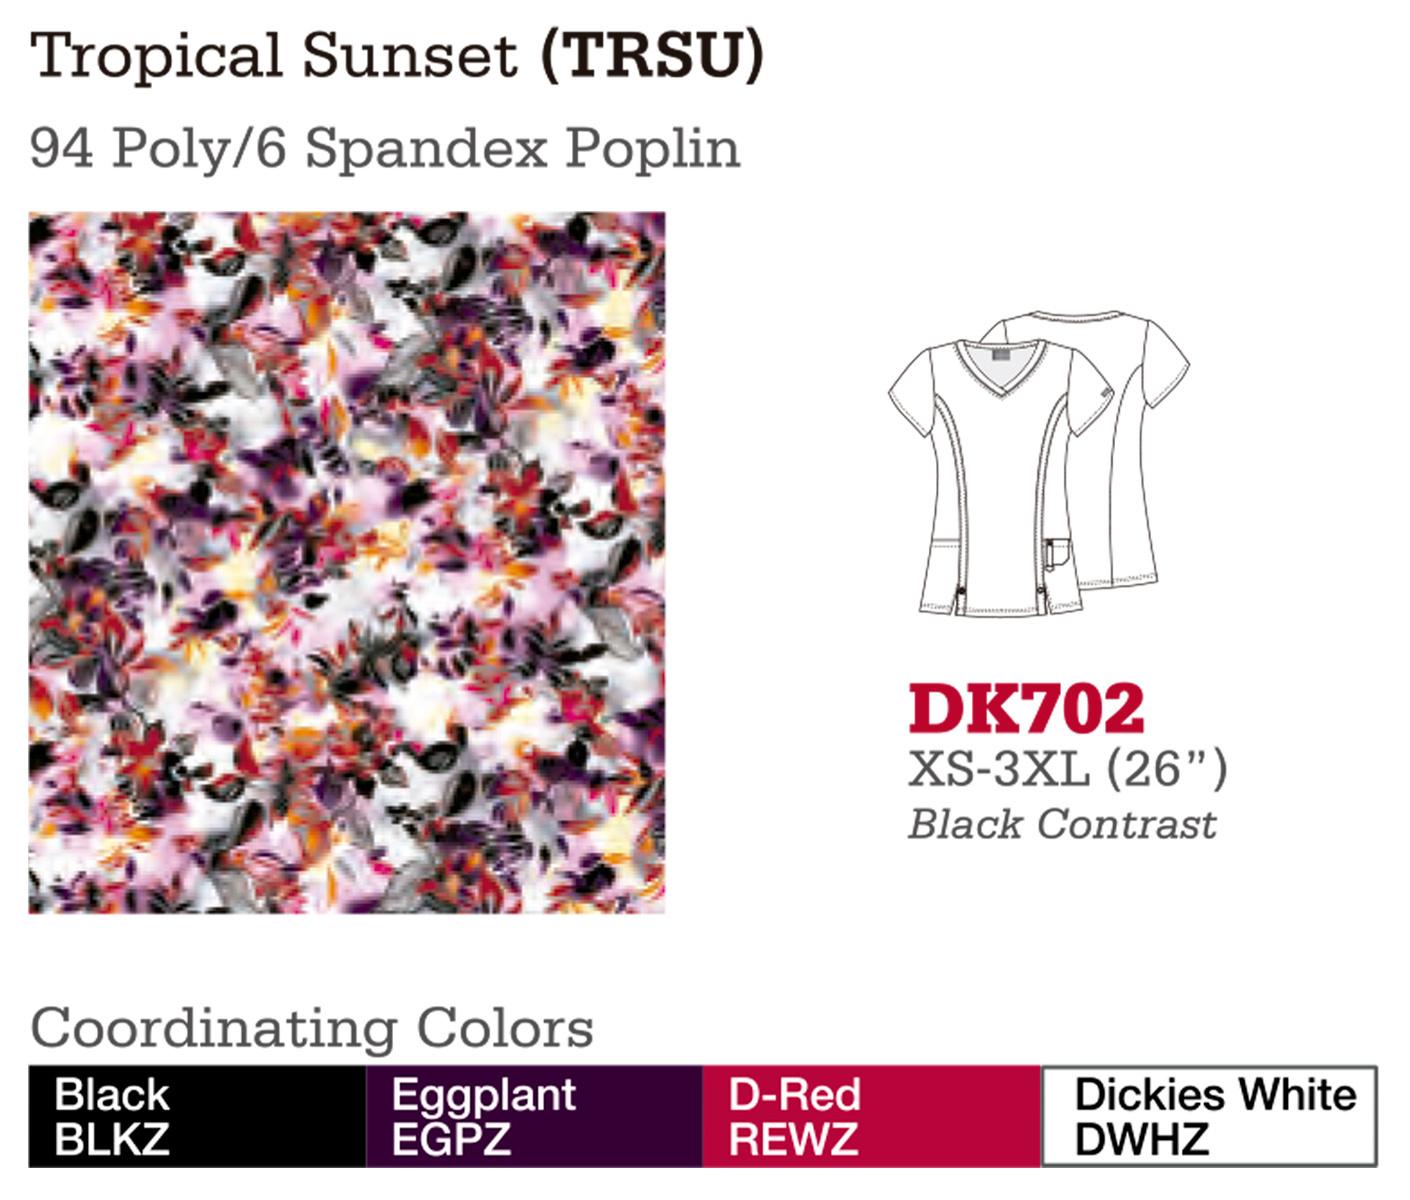 Tropical Sunset. DK702.